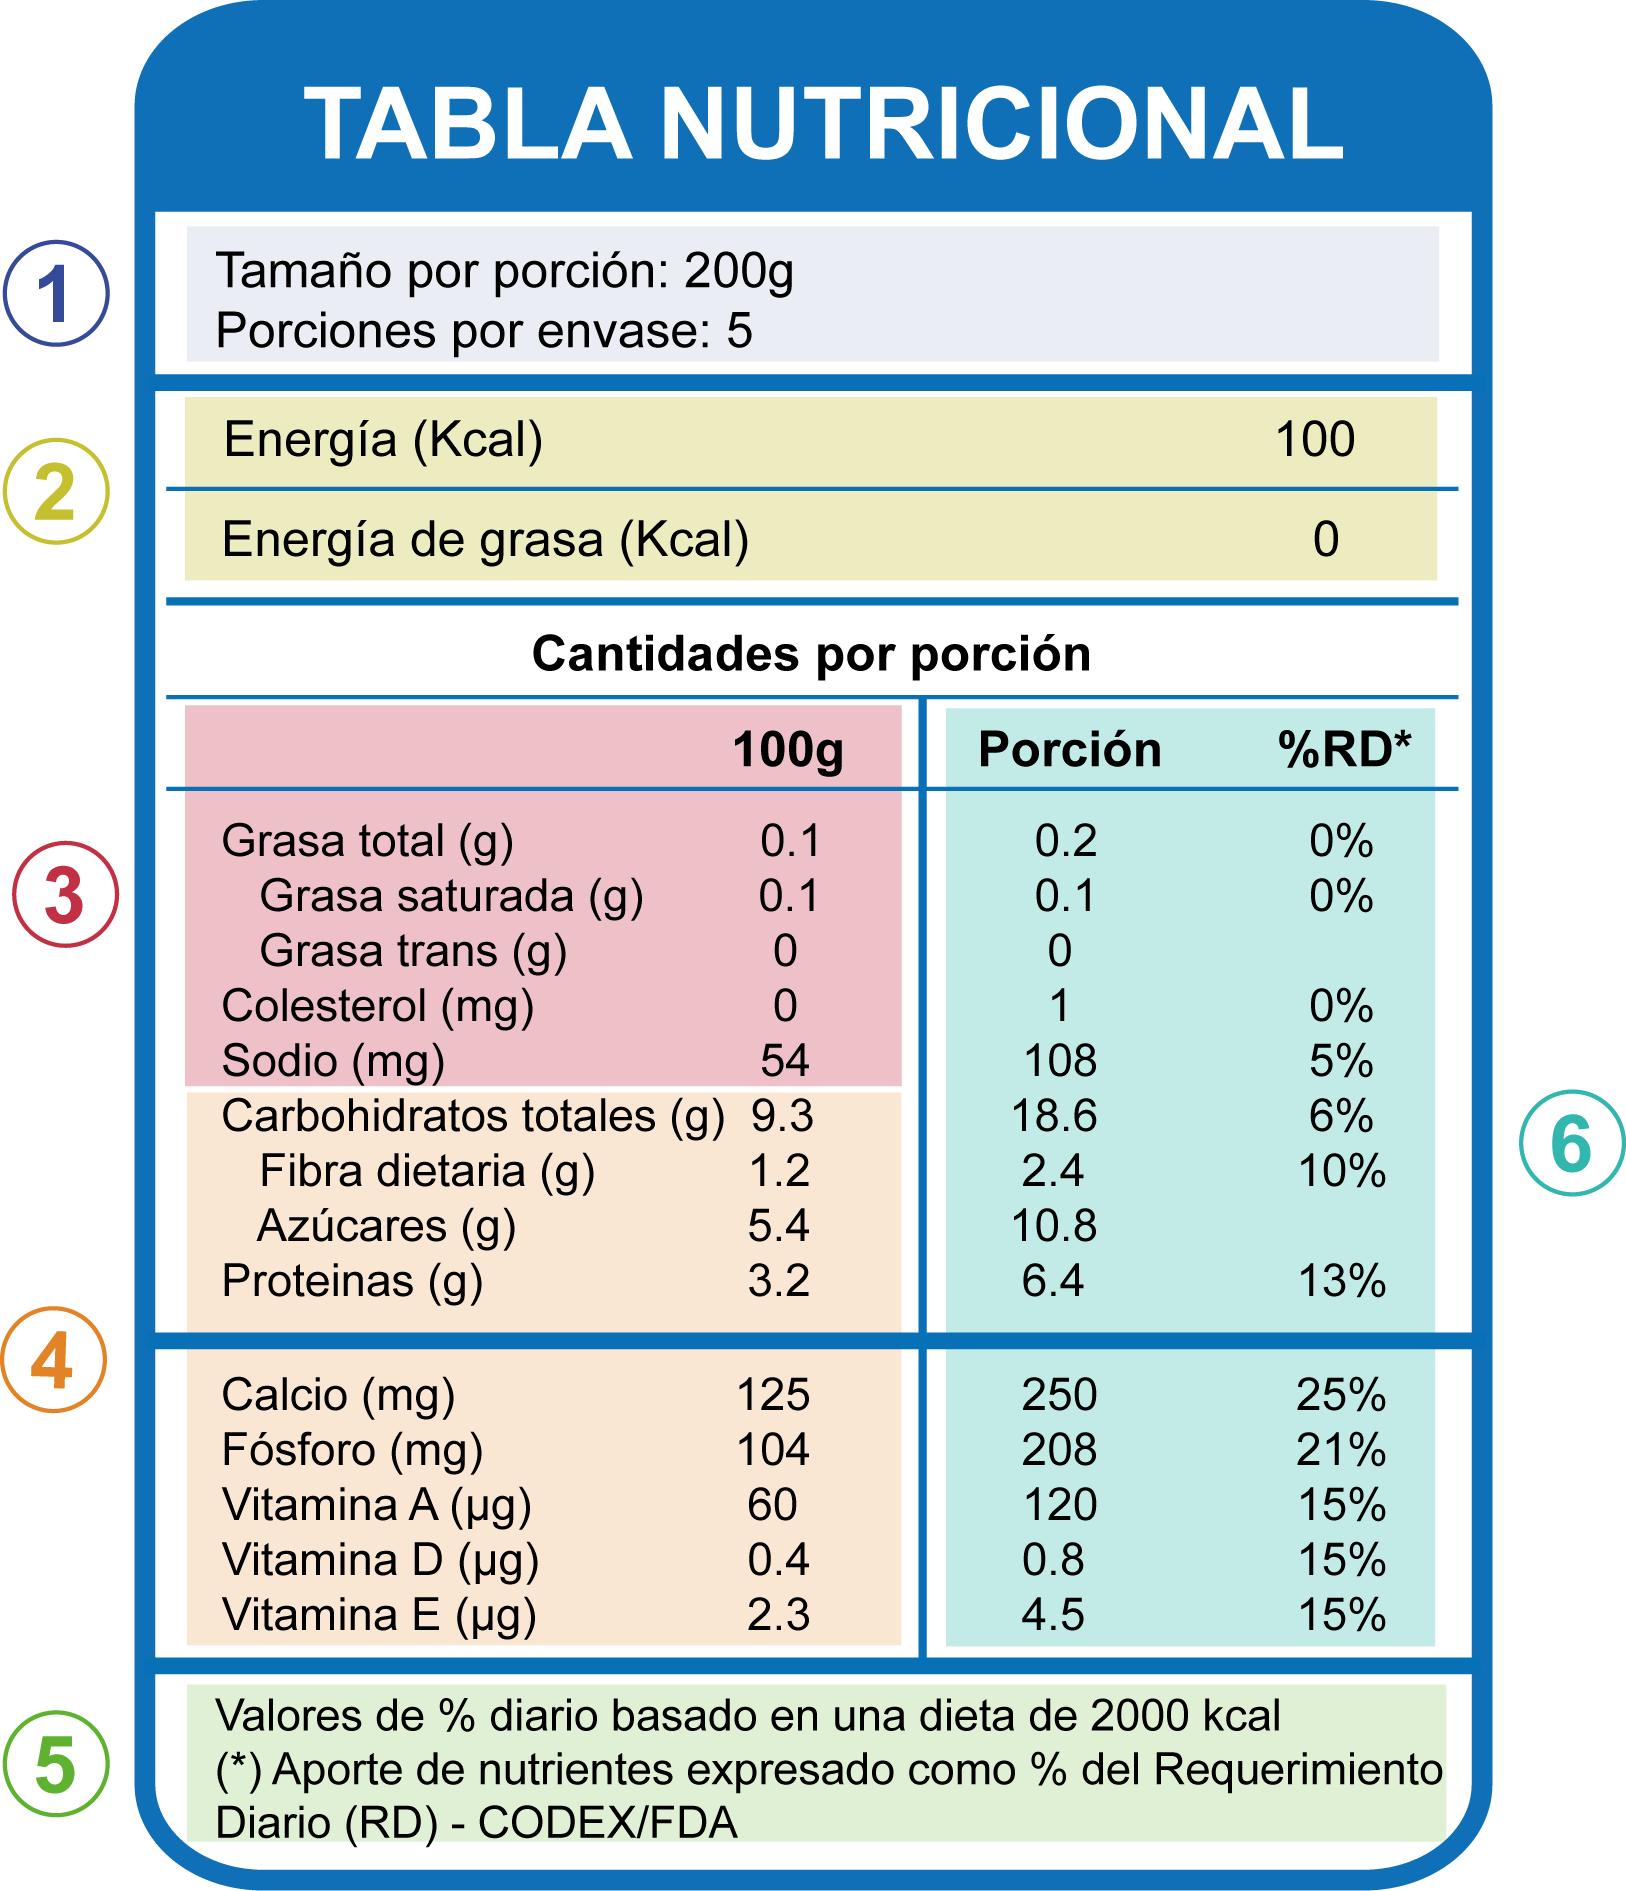 Tabla_Nutricional_ejemplo.png